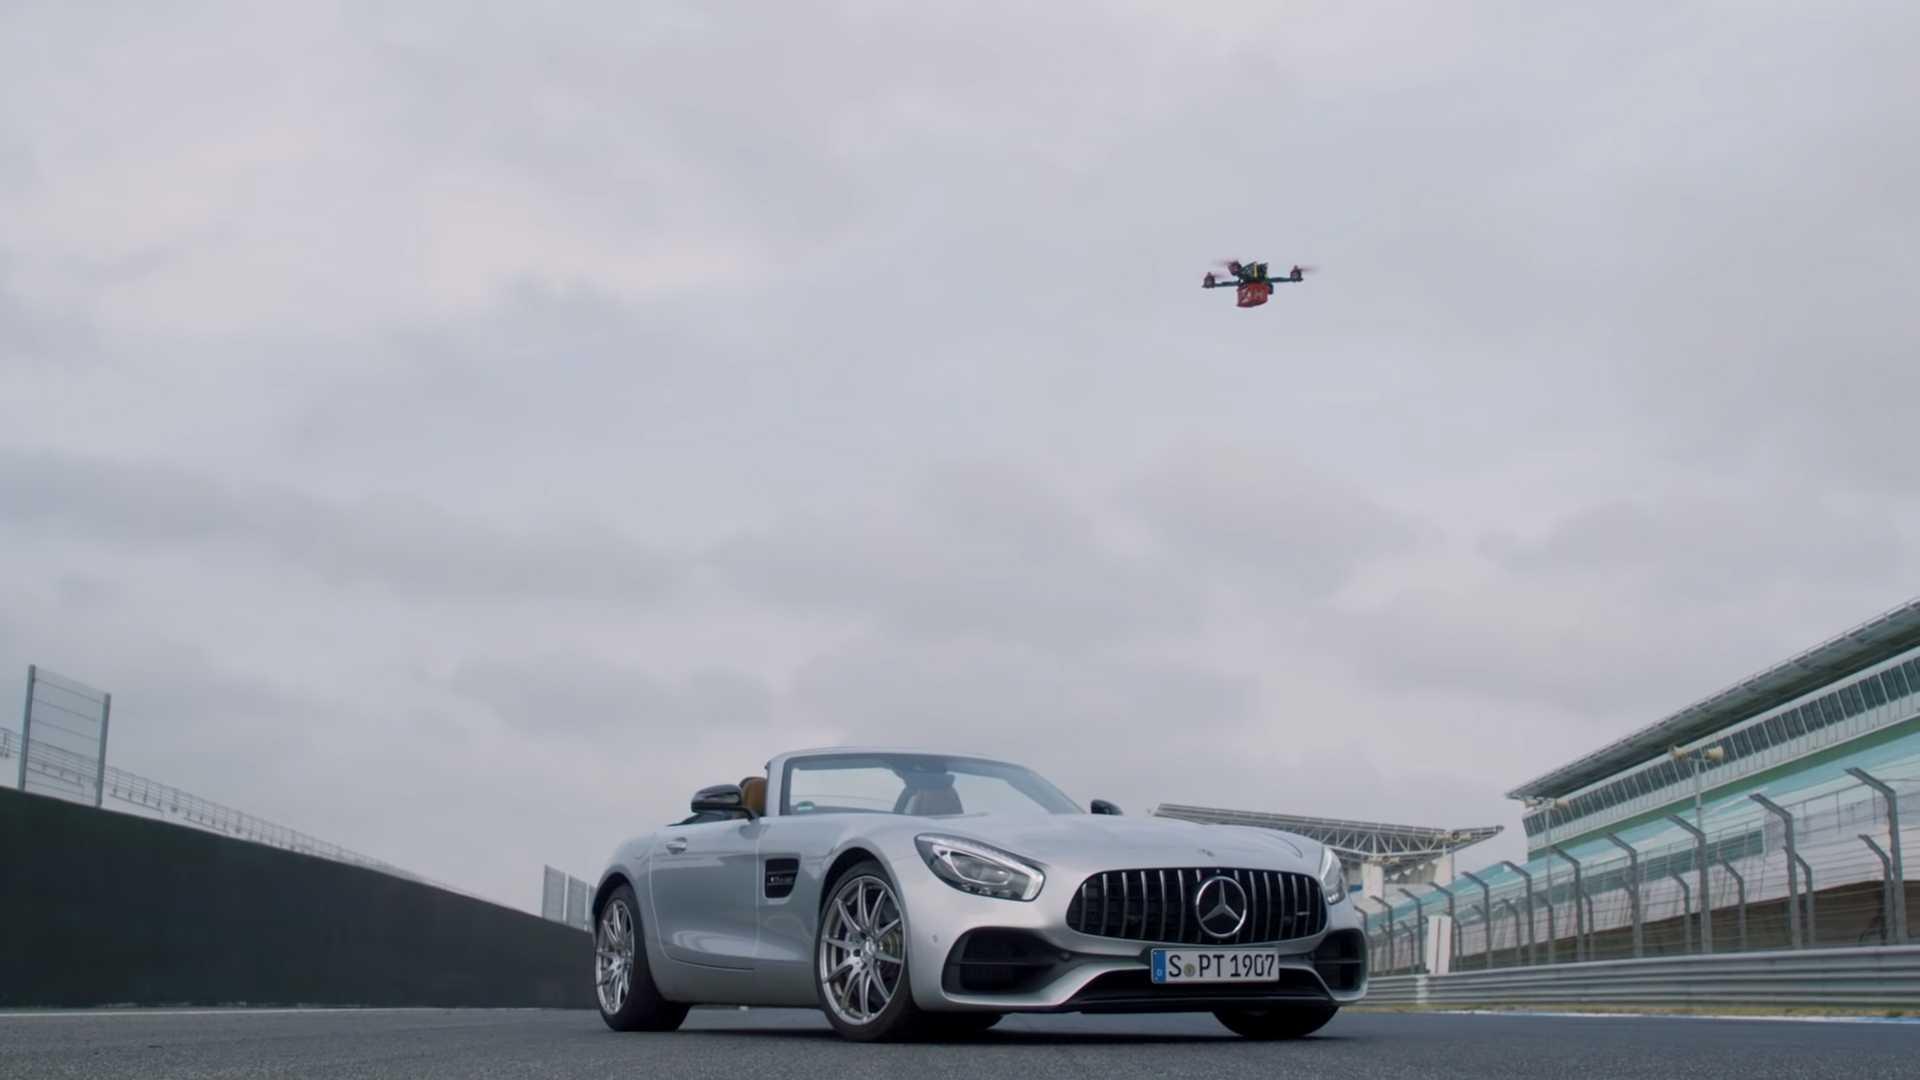 mercedes-amg-gt-vs-drone